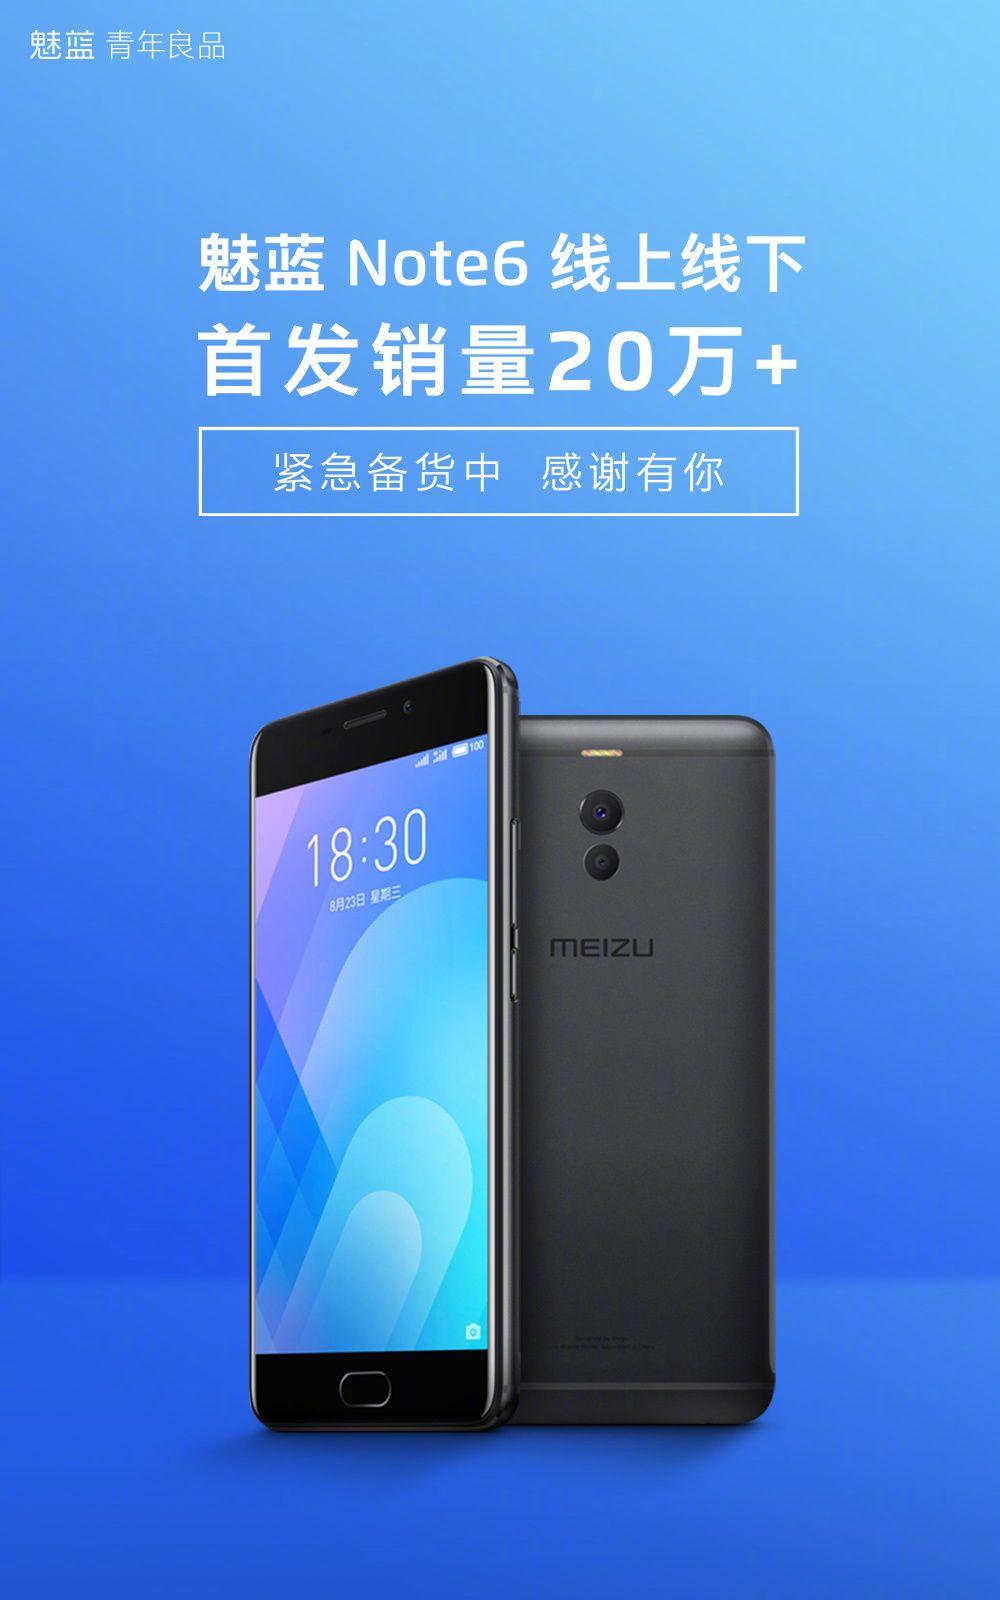 Meizu M6 Noteが9月1日、9月2日で20万台以上売り上げたことを報告